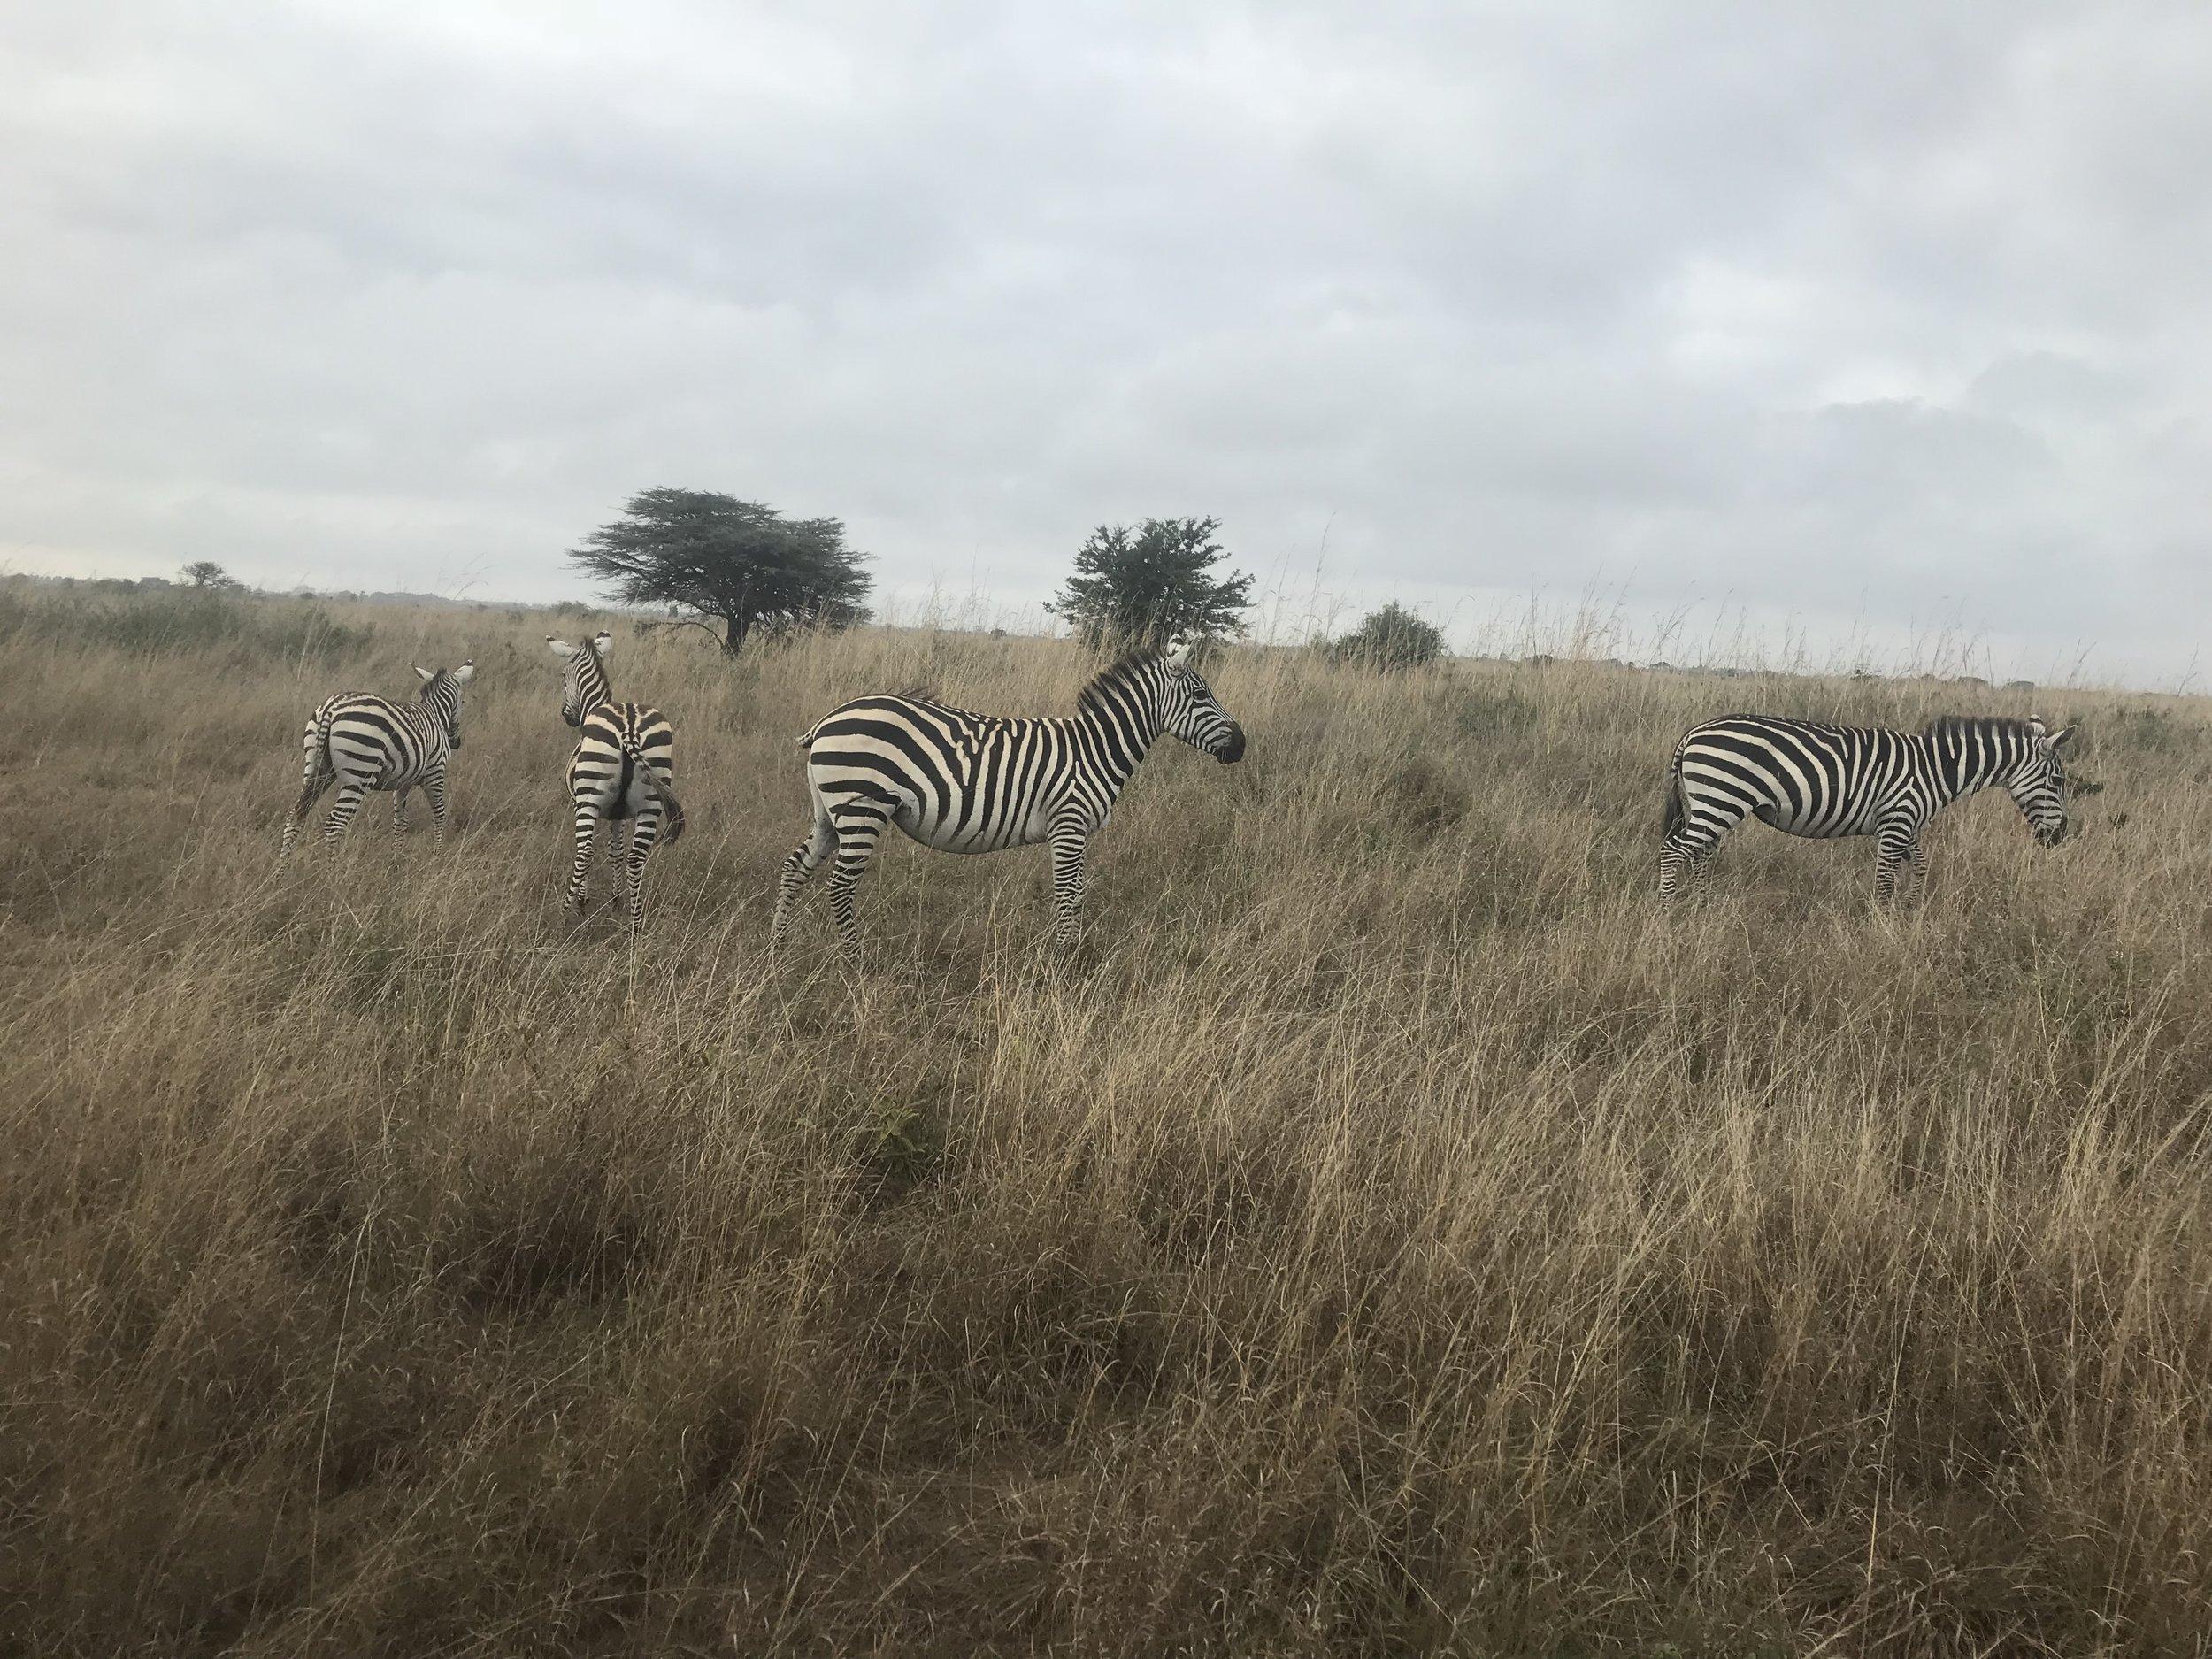 We saw a lot of zebras!